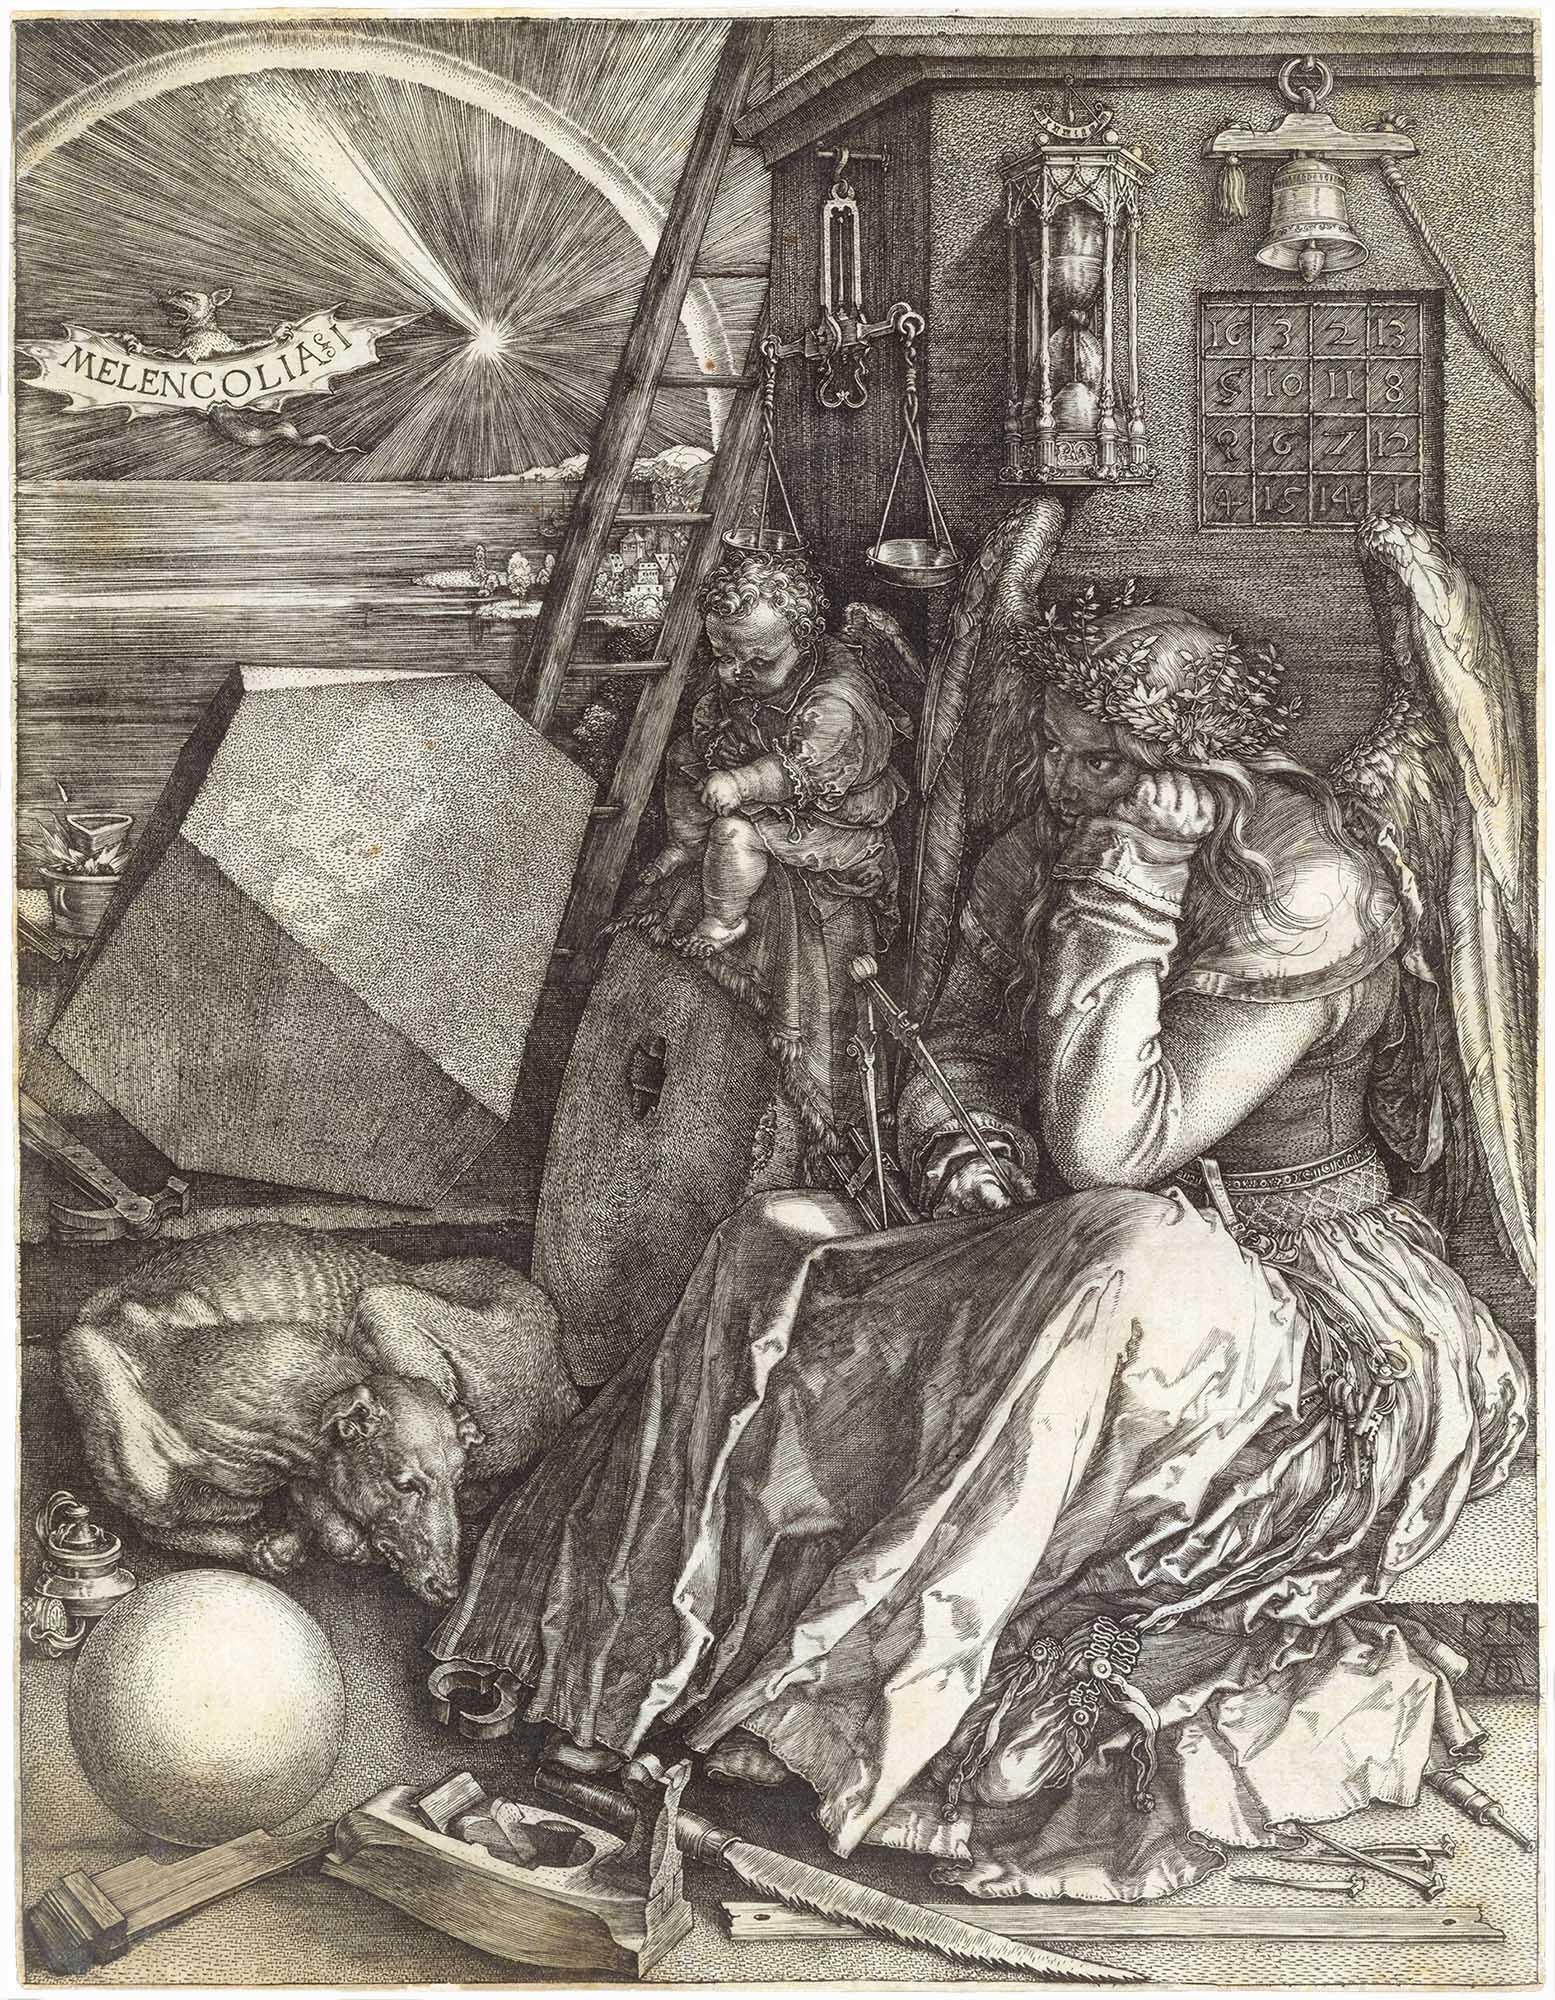 Albrecht Dürer, Melencolia I,1514, engraving, 24 x 18.5 cm (The Metropolitan Museum of Art)